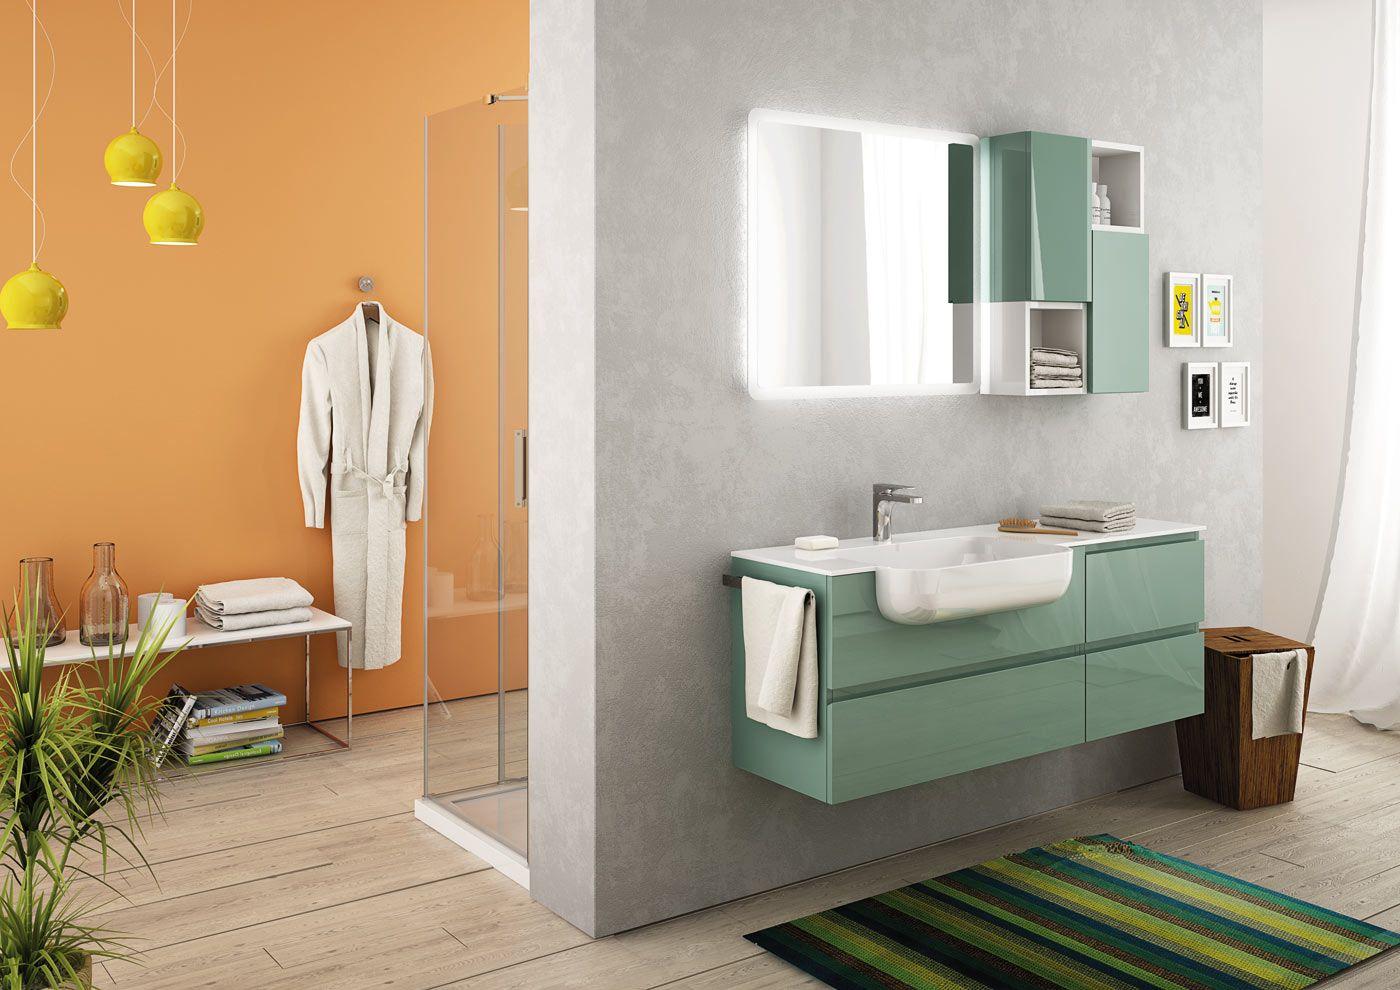 Mobile bagno verde acqua wc84 regardsdefemmes - Legnobagno prezzi ...